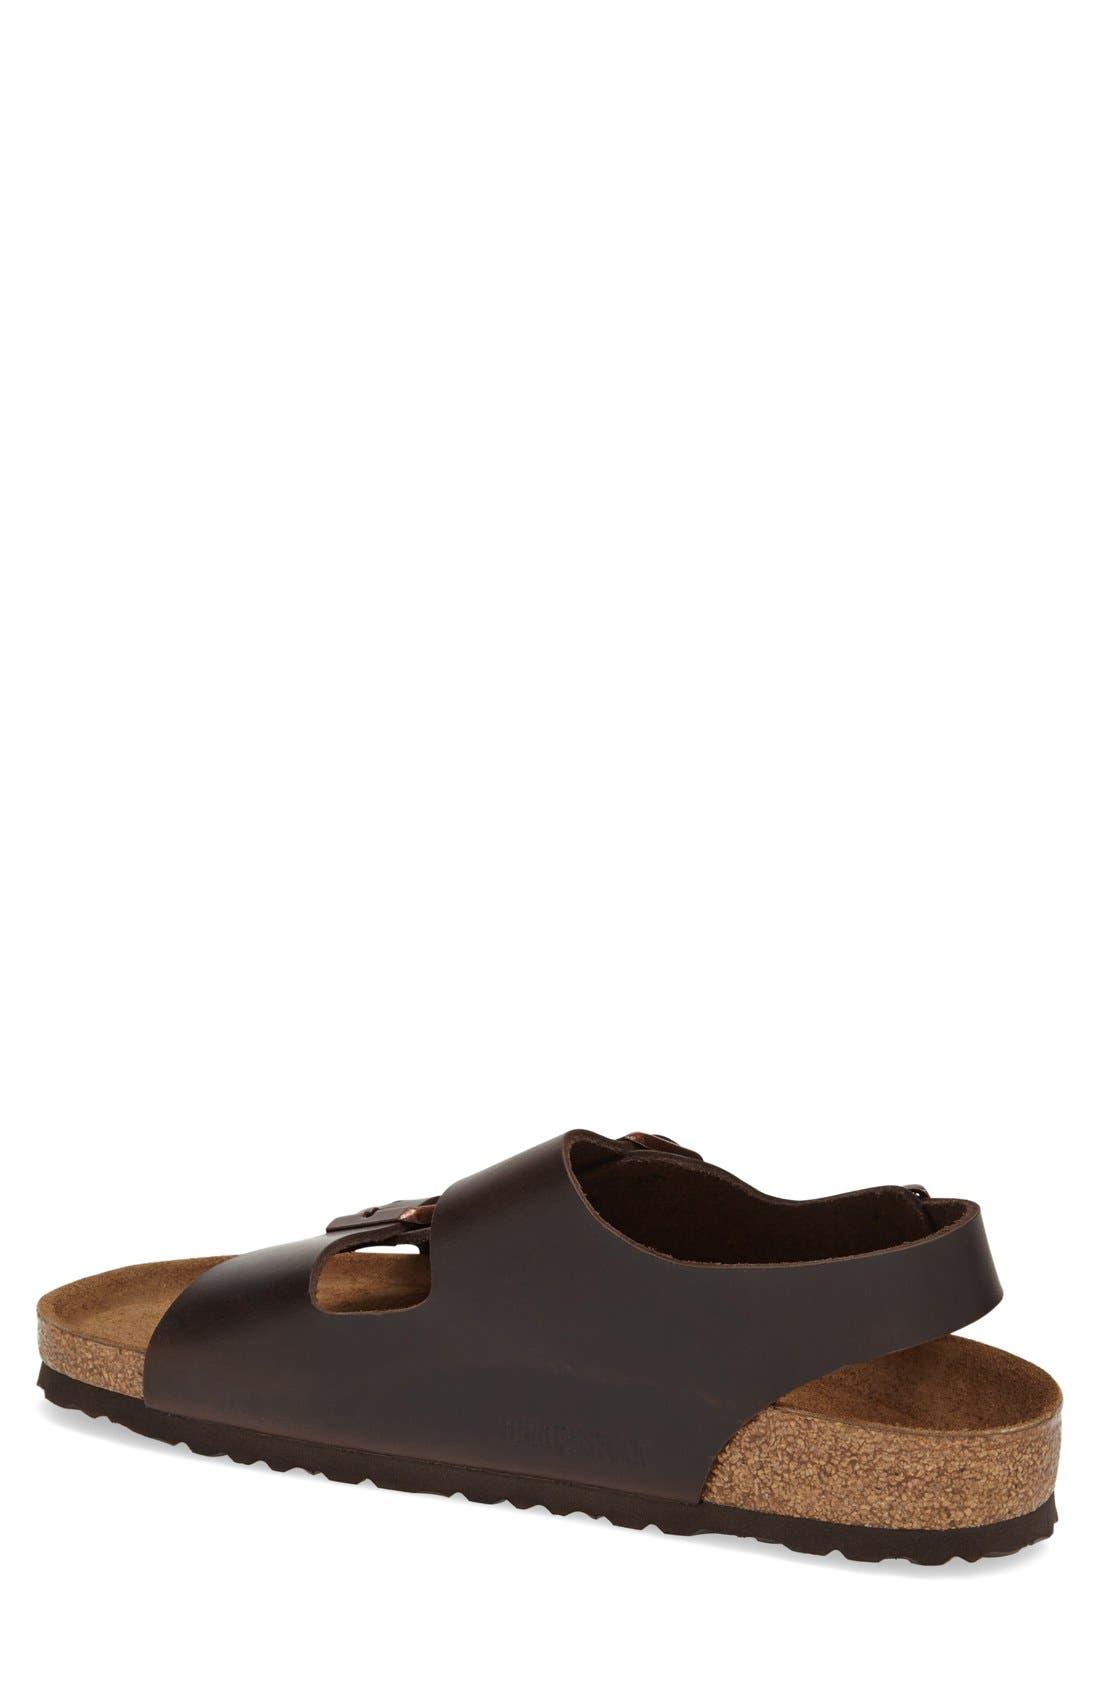 'Milano' Soft Footbed Sandal,                             Alternate thumbnail 2, color,                             AMALFI BROWN